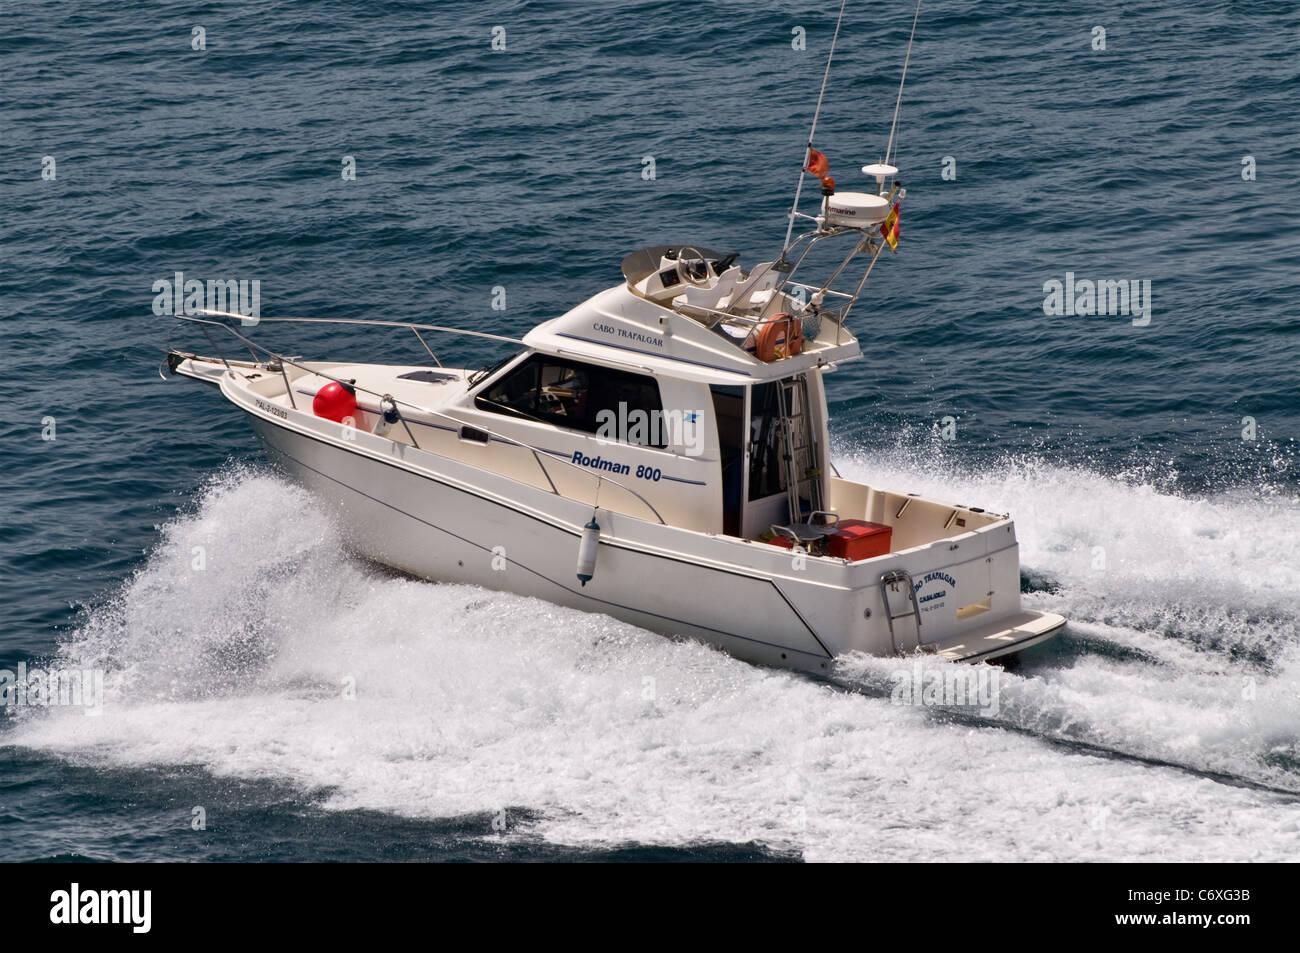 Small fast fishing boat pleasure craft rodman 800 stock for Fast fishing boats